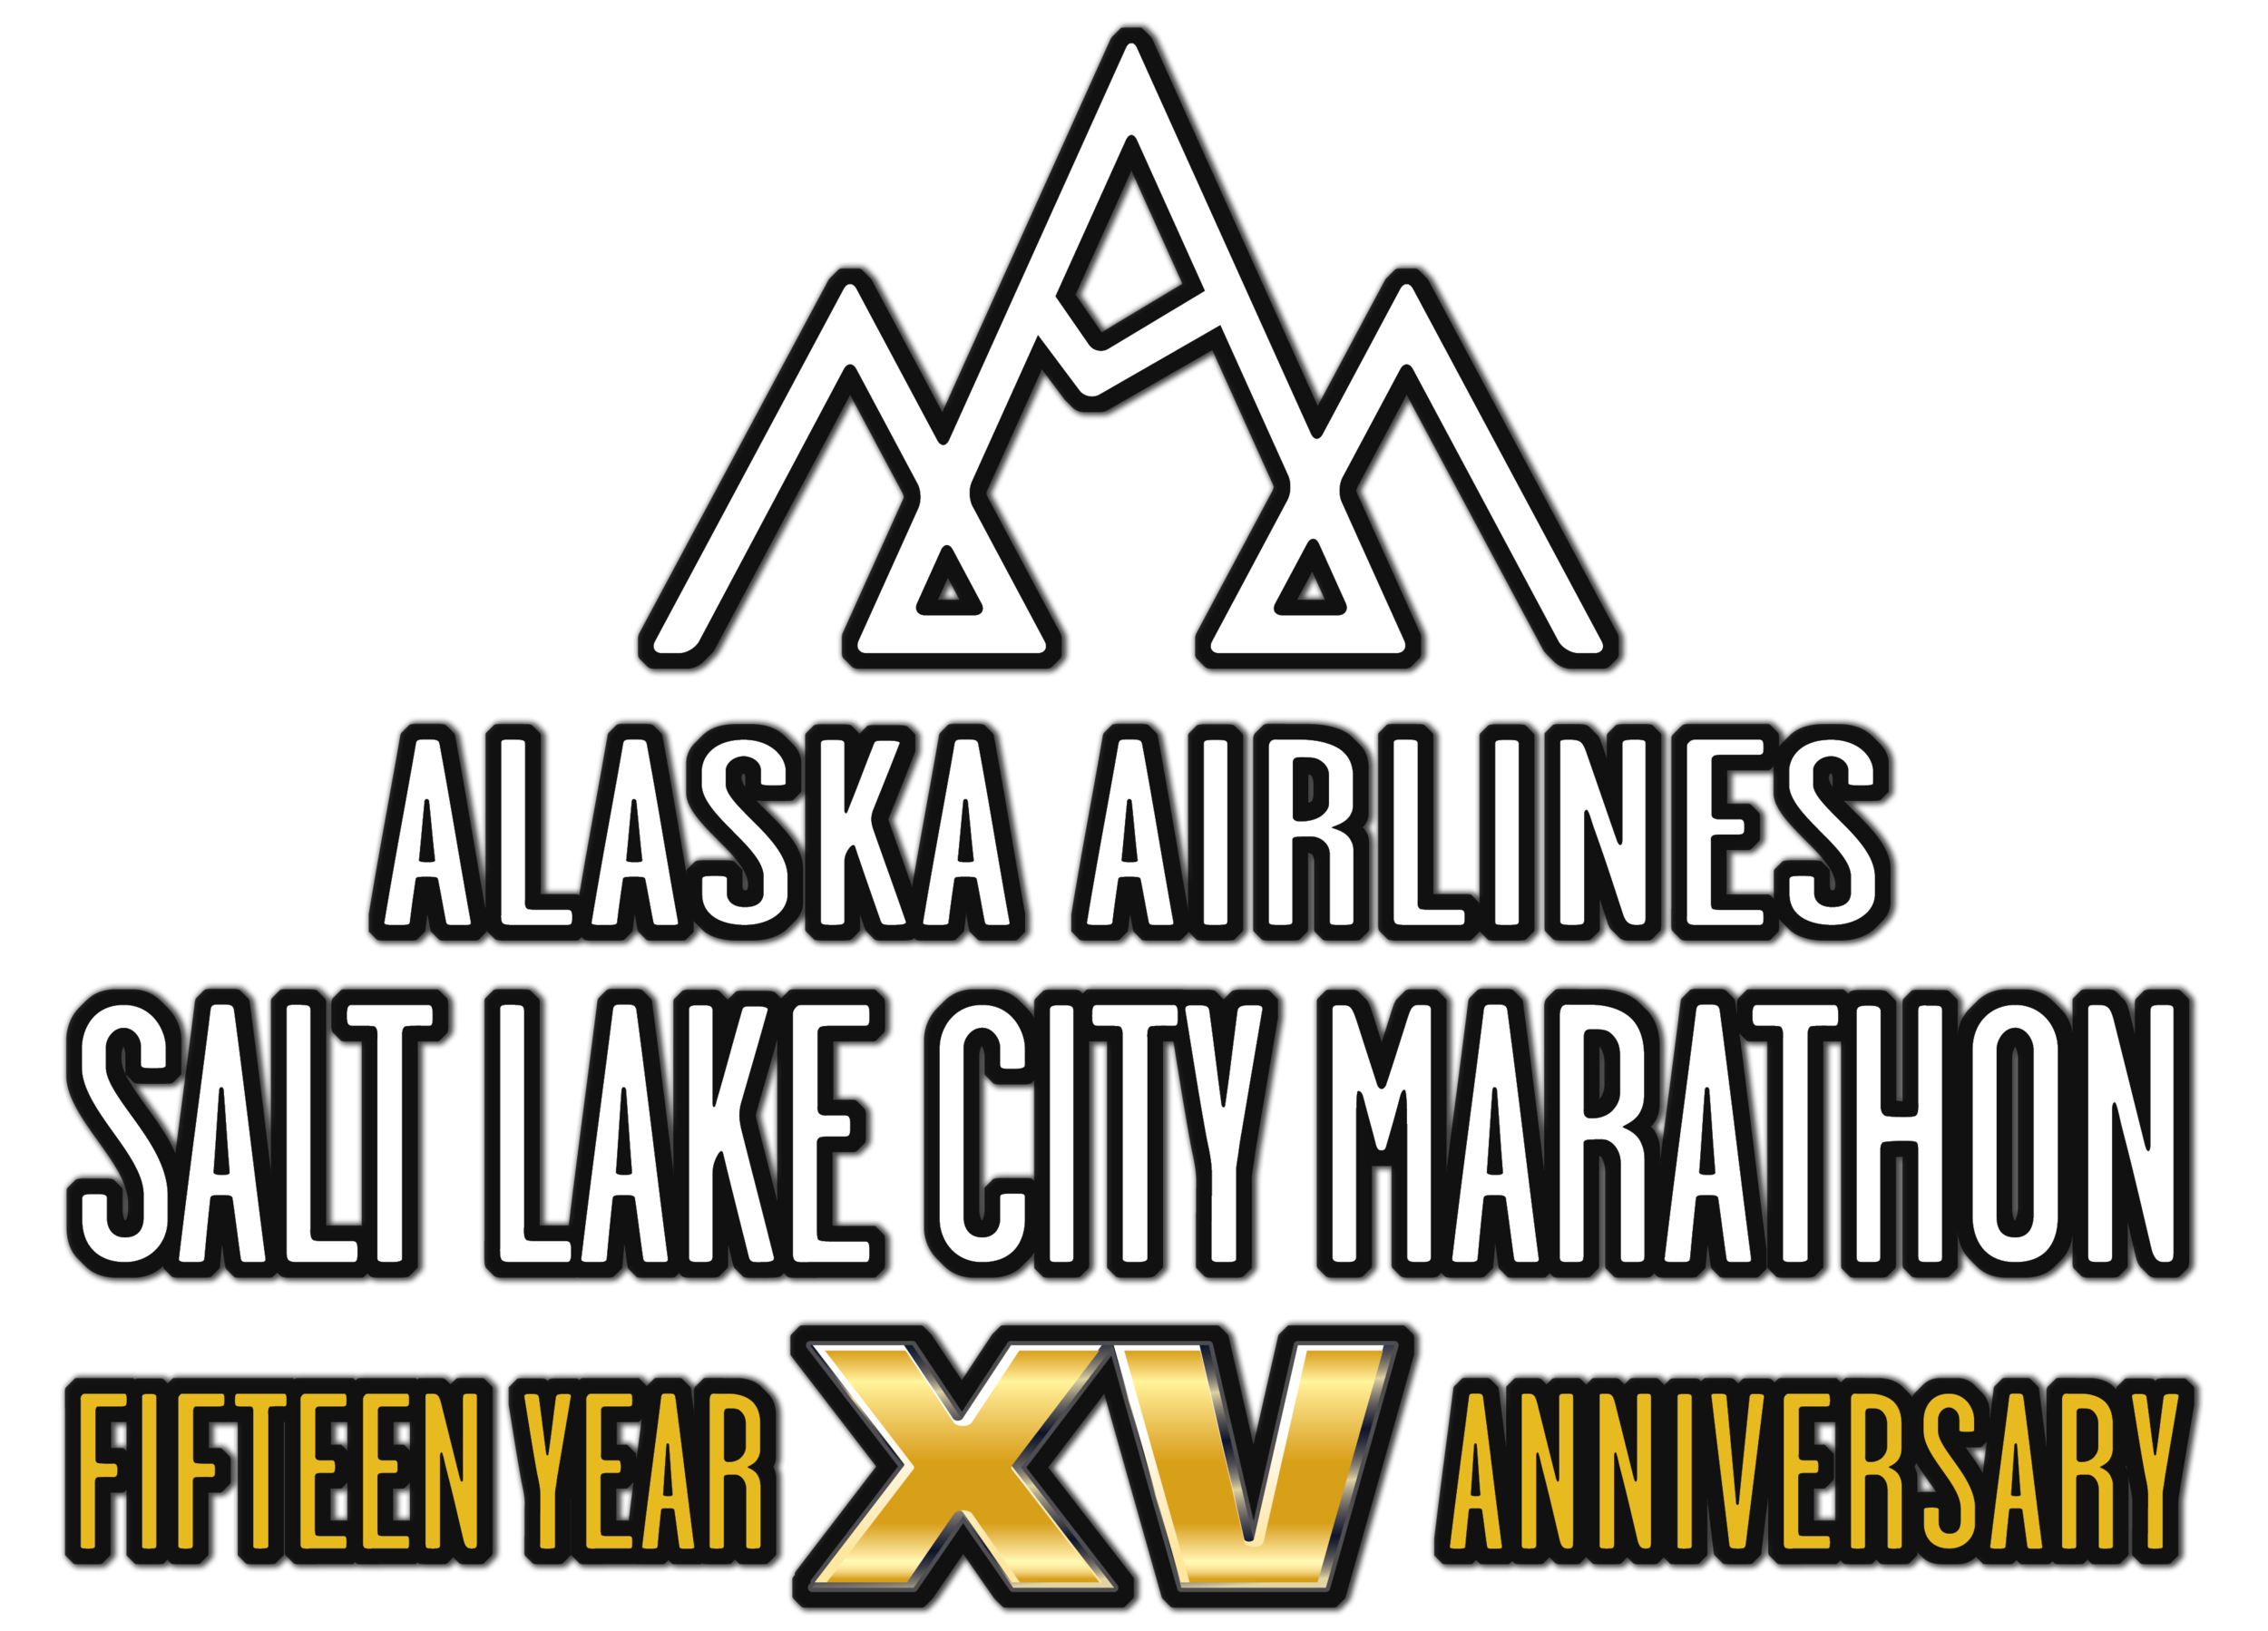 Salt lake city marathon - Official Promotional Photographer for the SLC Marathon.